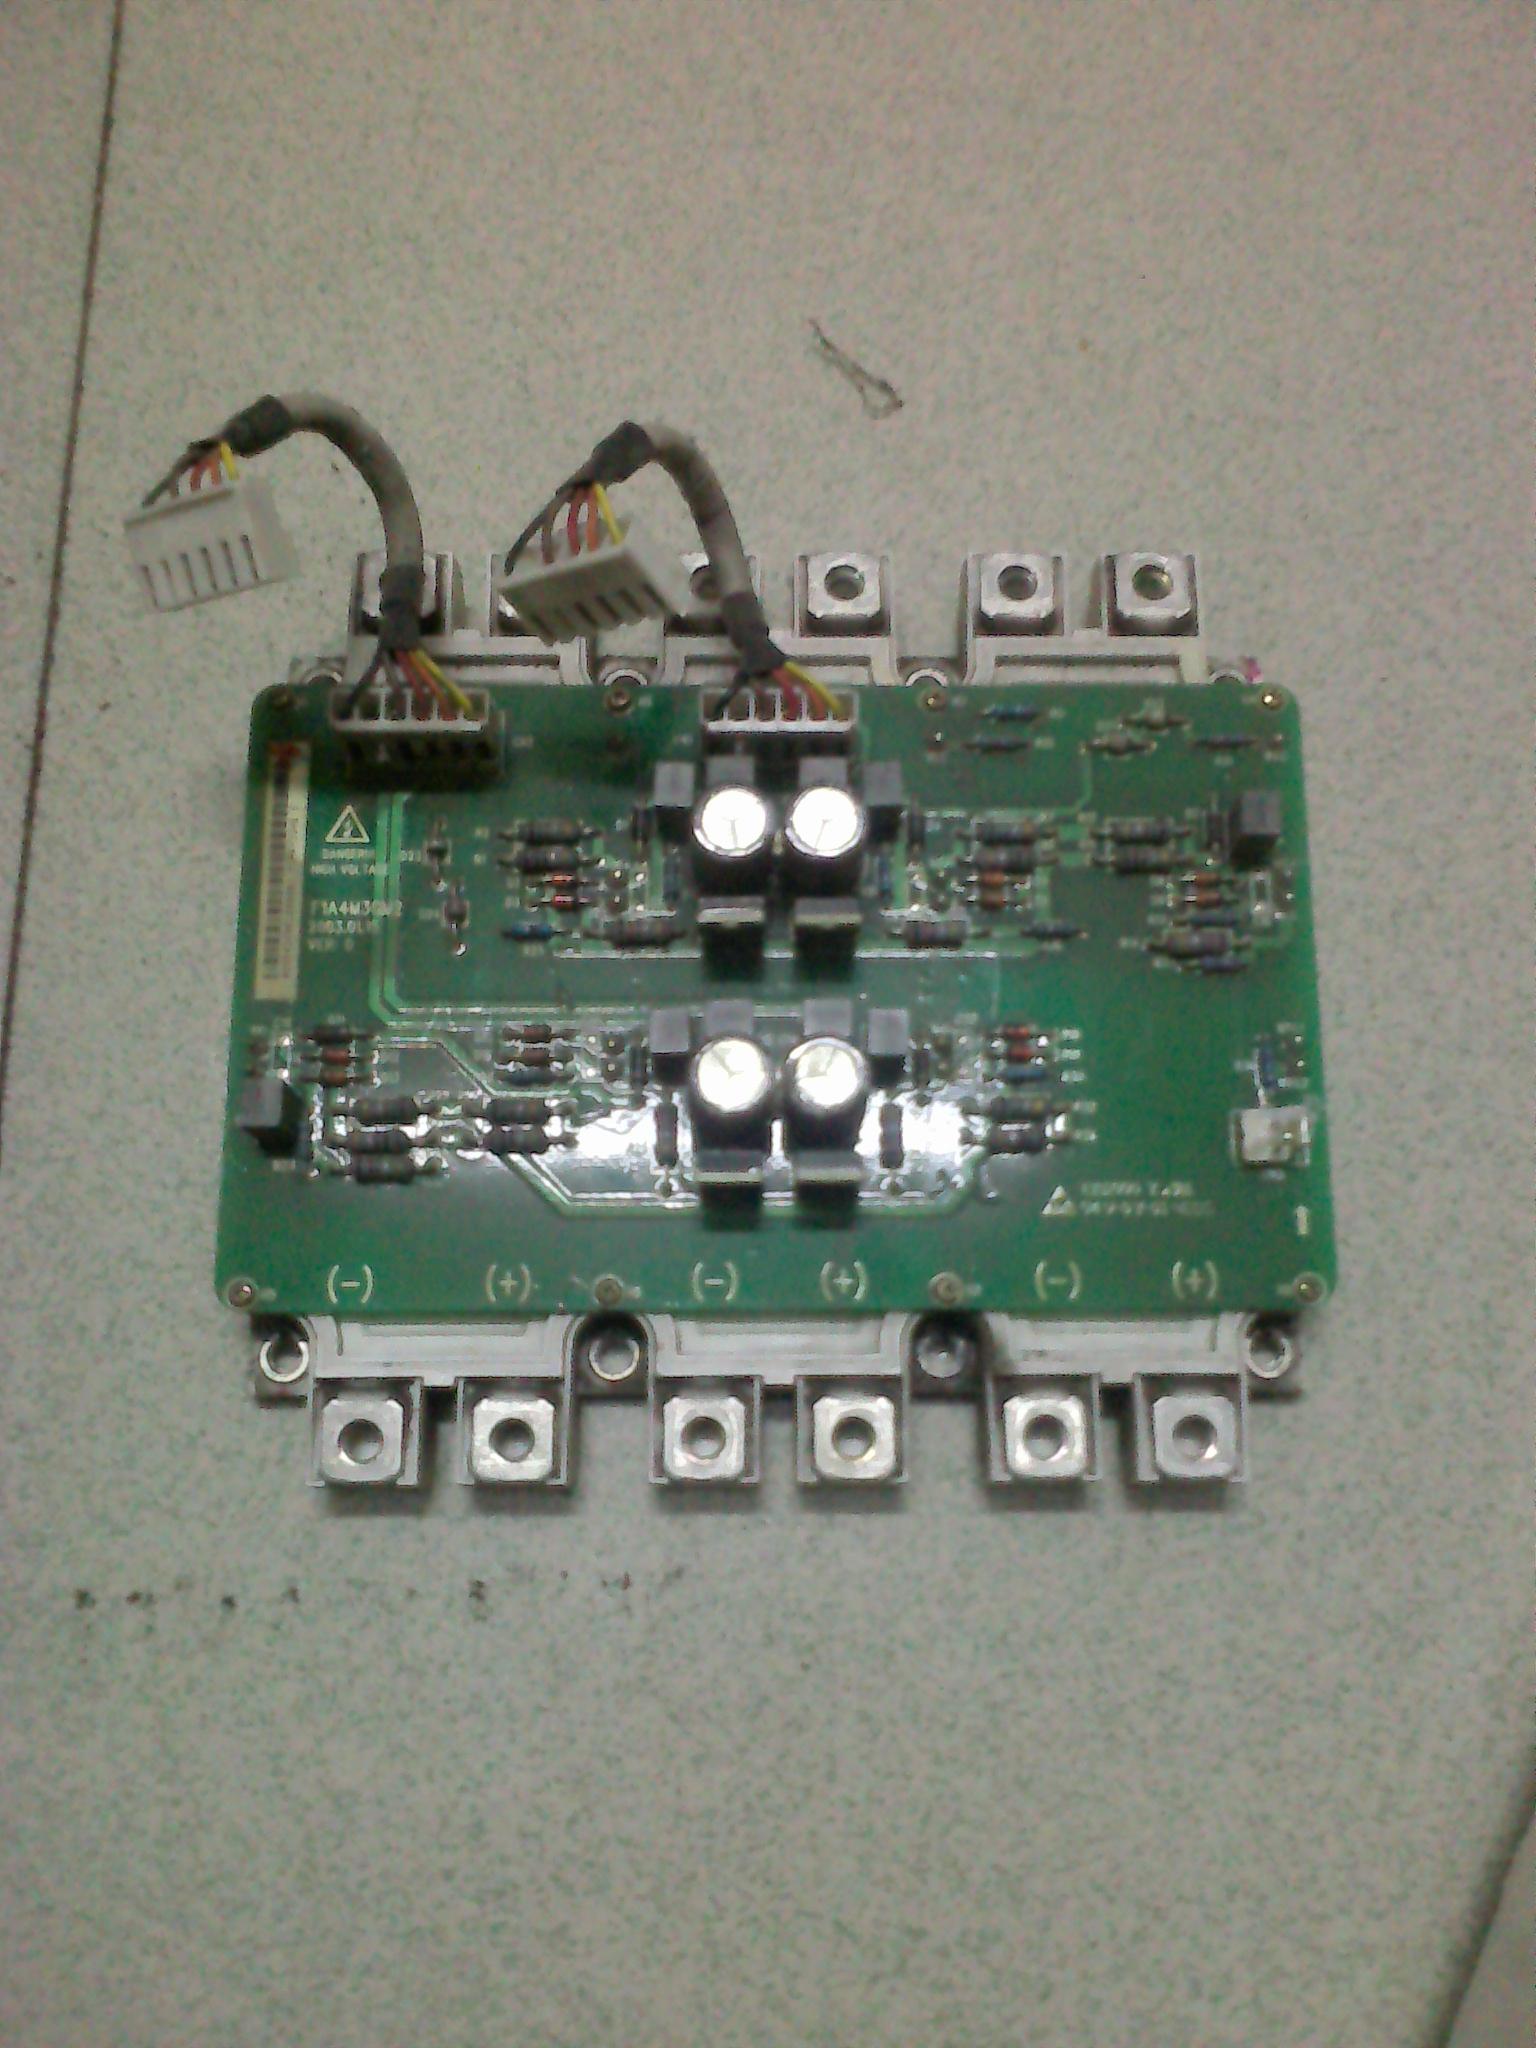 M-Series Traditional I/O :VE4001S2T1B1 VE4001S2T2B4 VE4002S1T2B5 VE4002S1T1B1 VE4003S2B1 VE4005